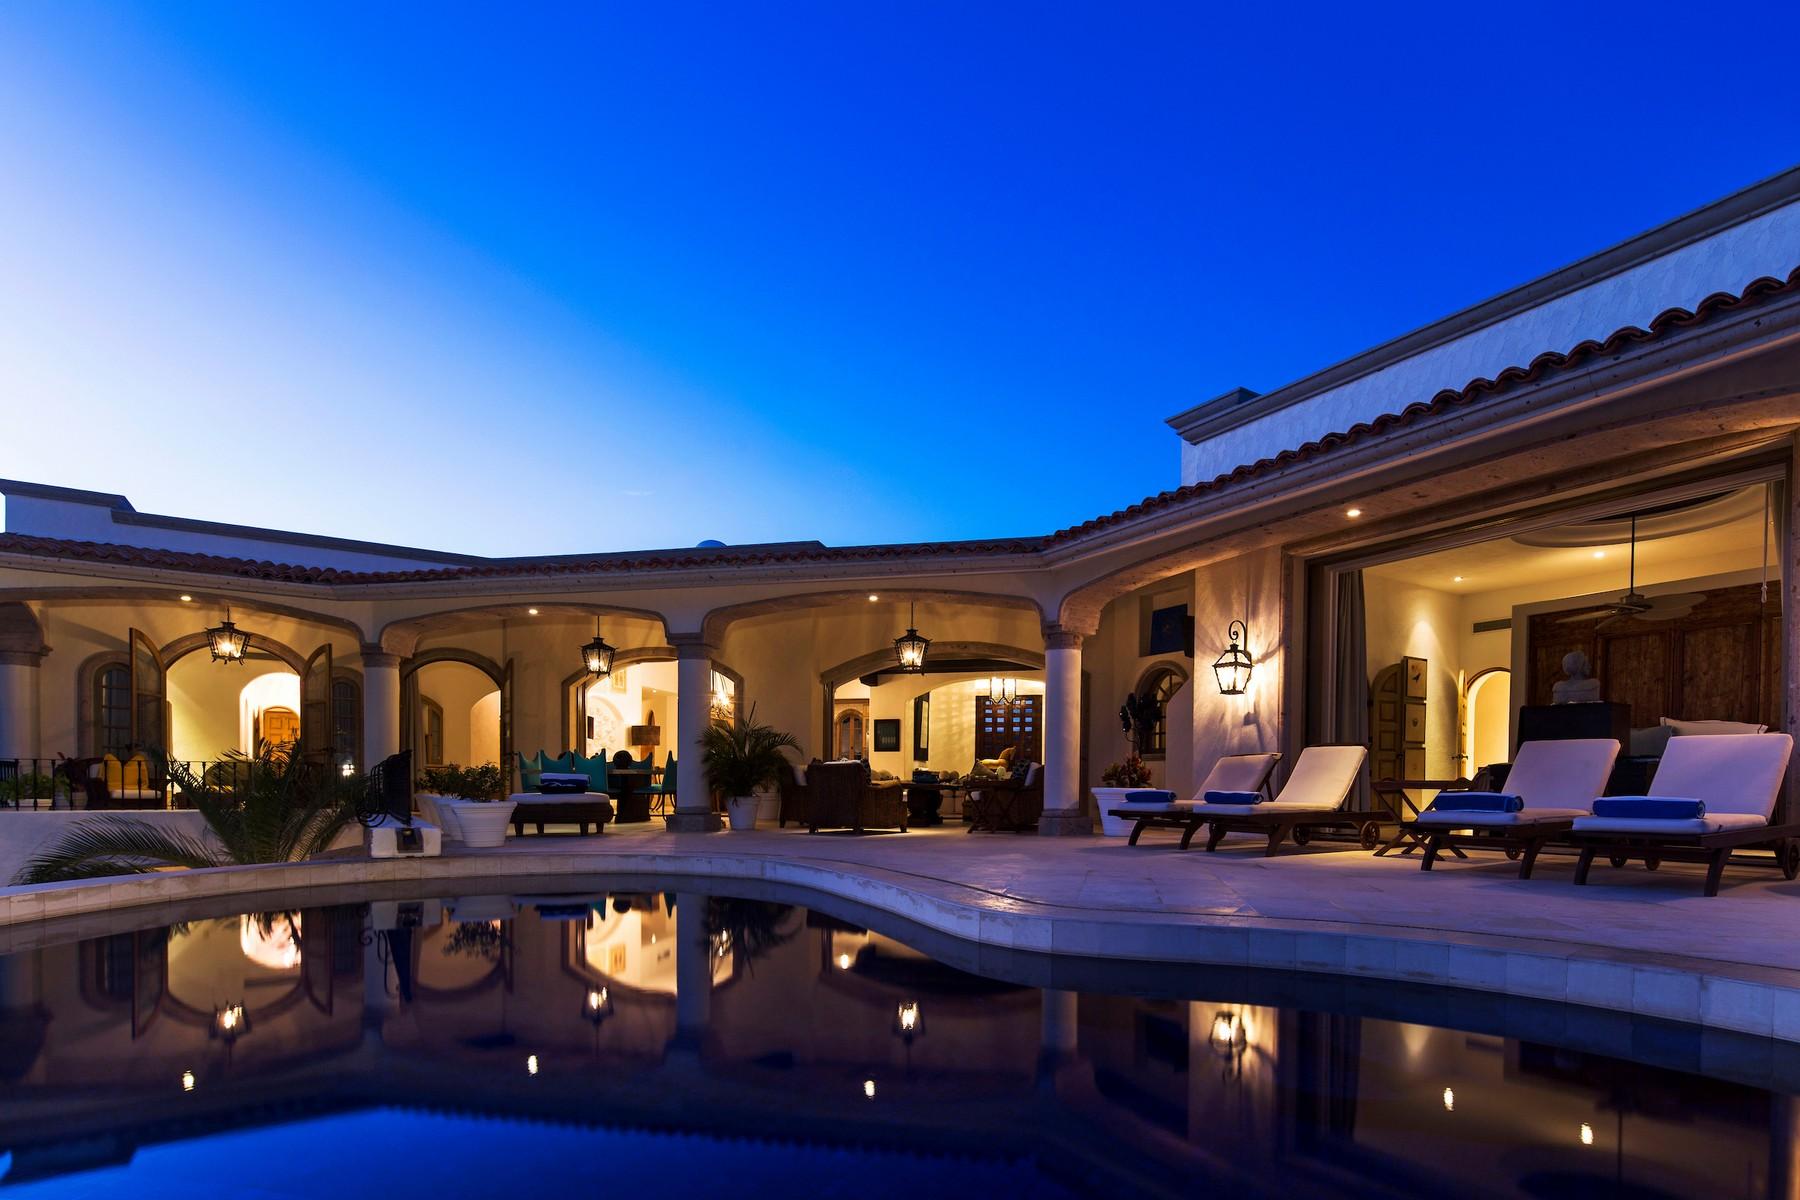 Single Family Home for Sale at Casa Buena Vida Las Colinas Lote 34 Casa Buena Vida Cabo San Lucas, 23455 Mexico